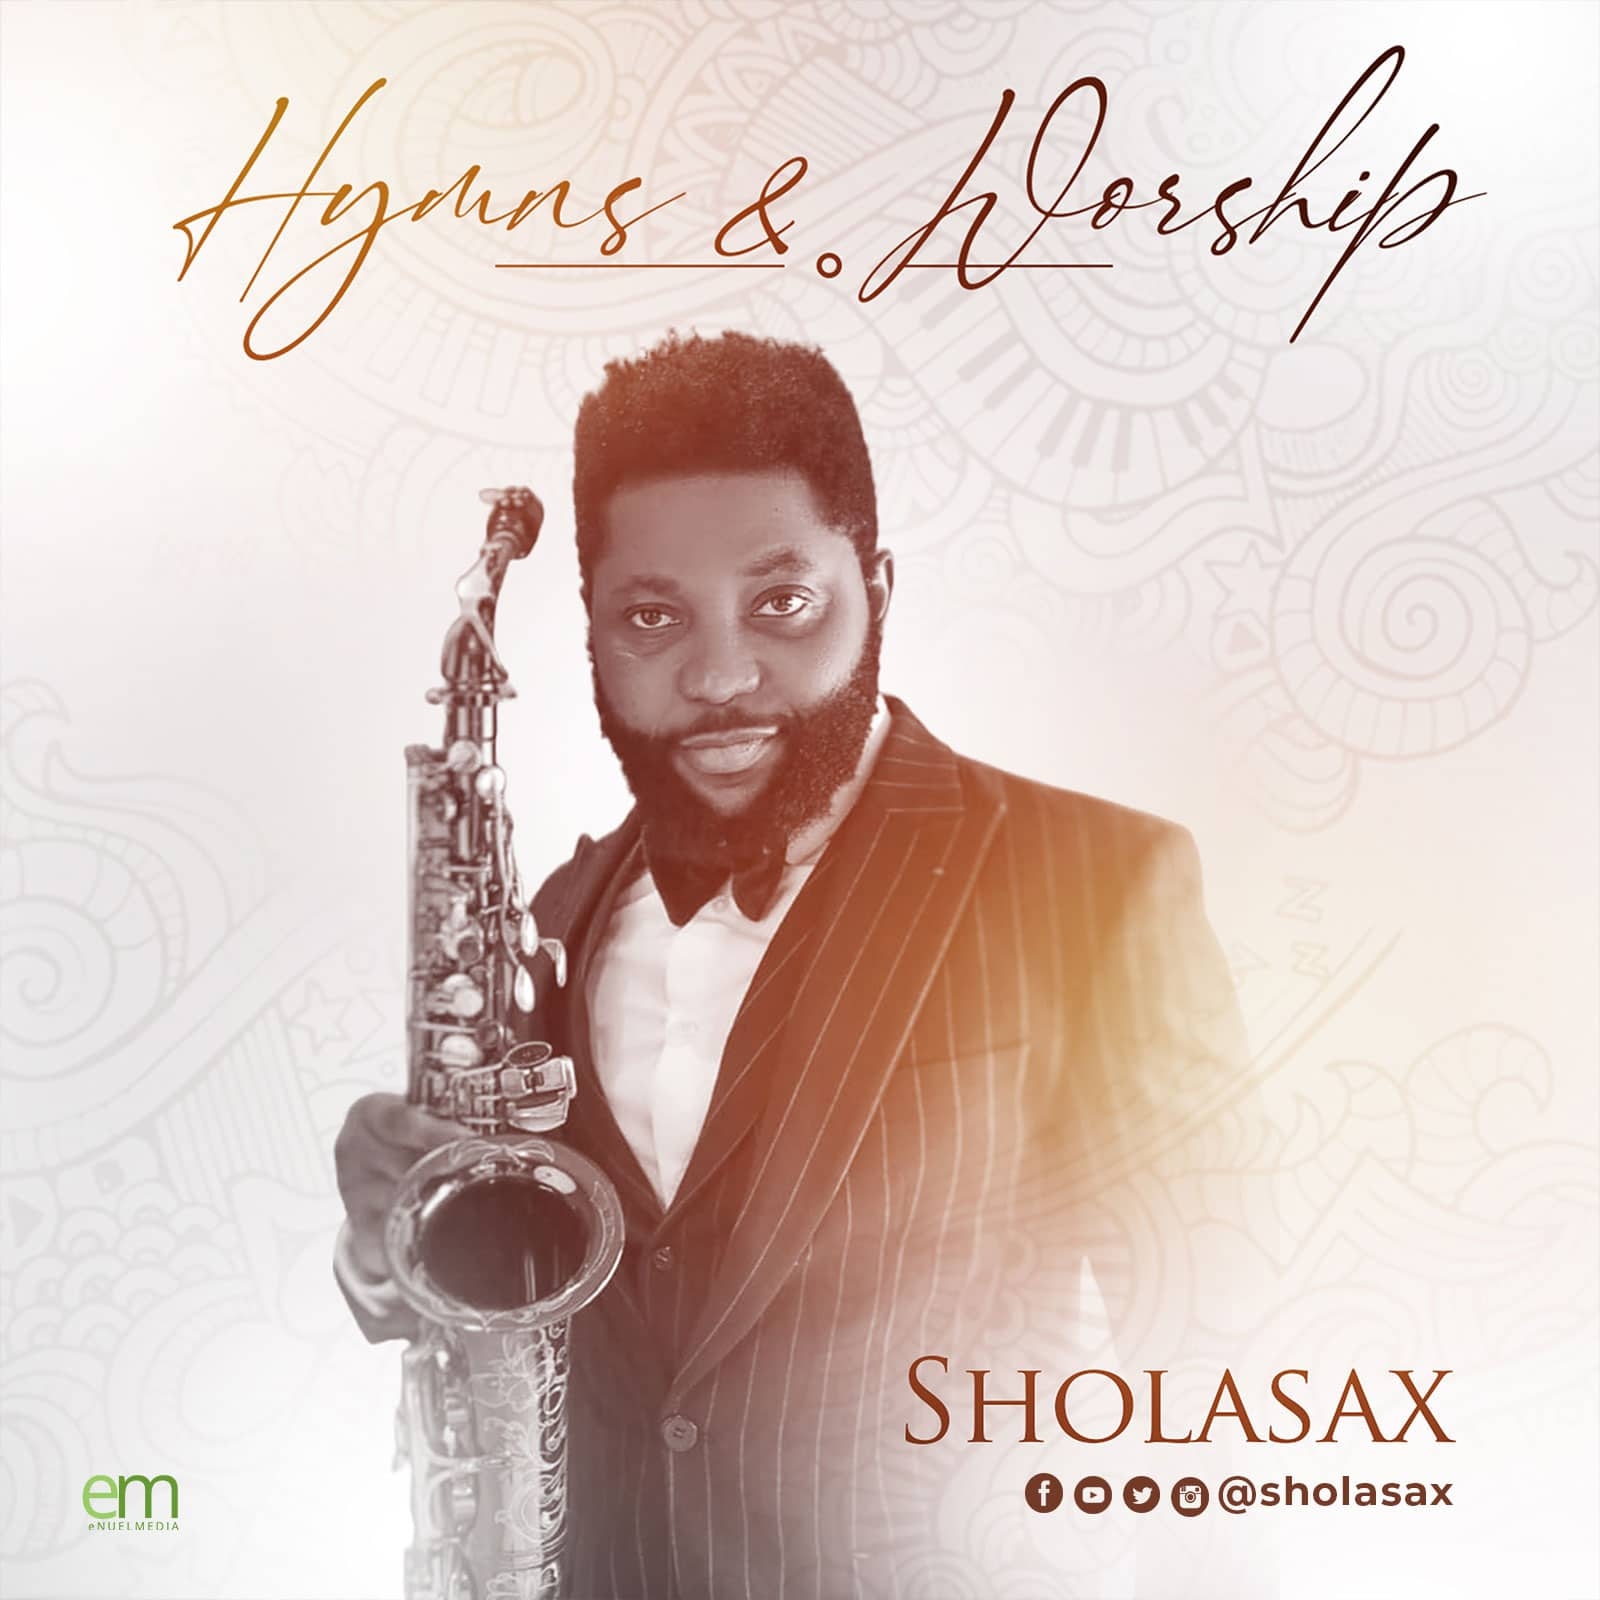 SholaSax hymns and worship